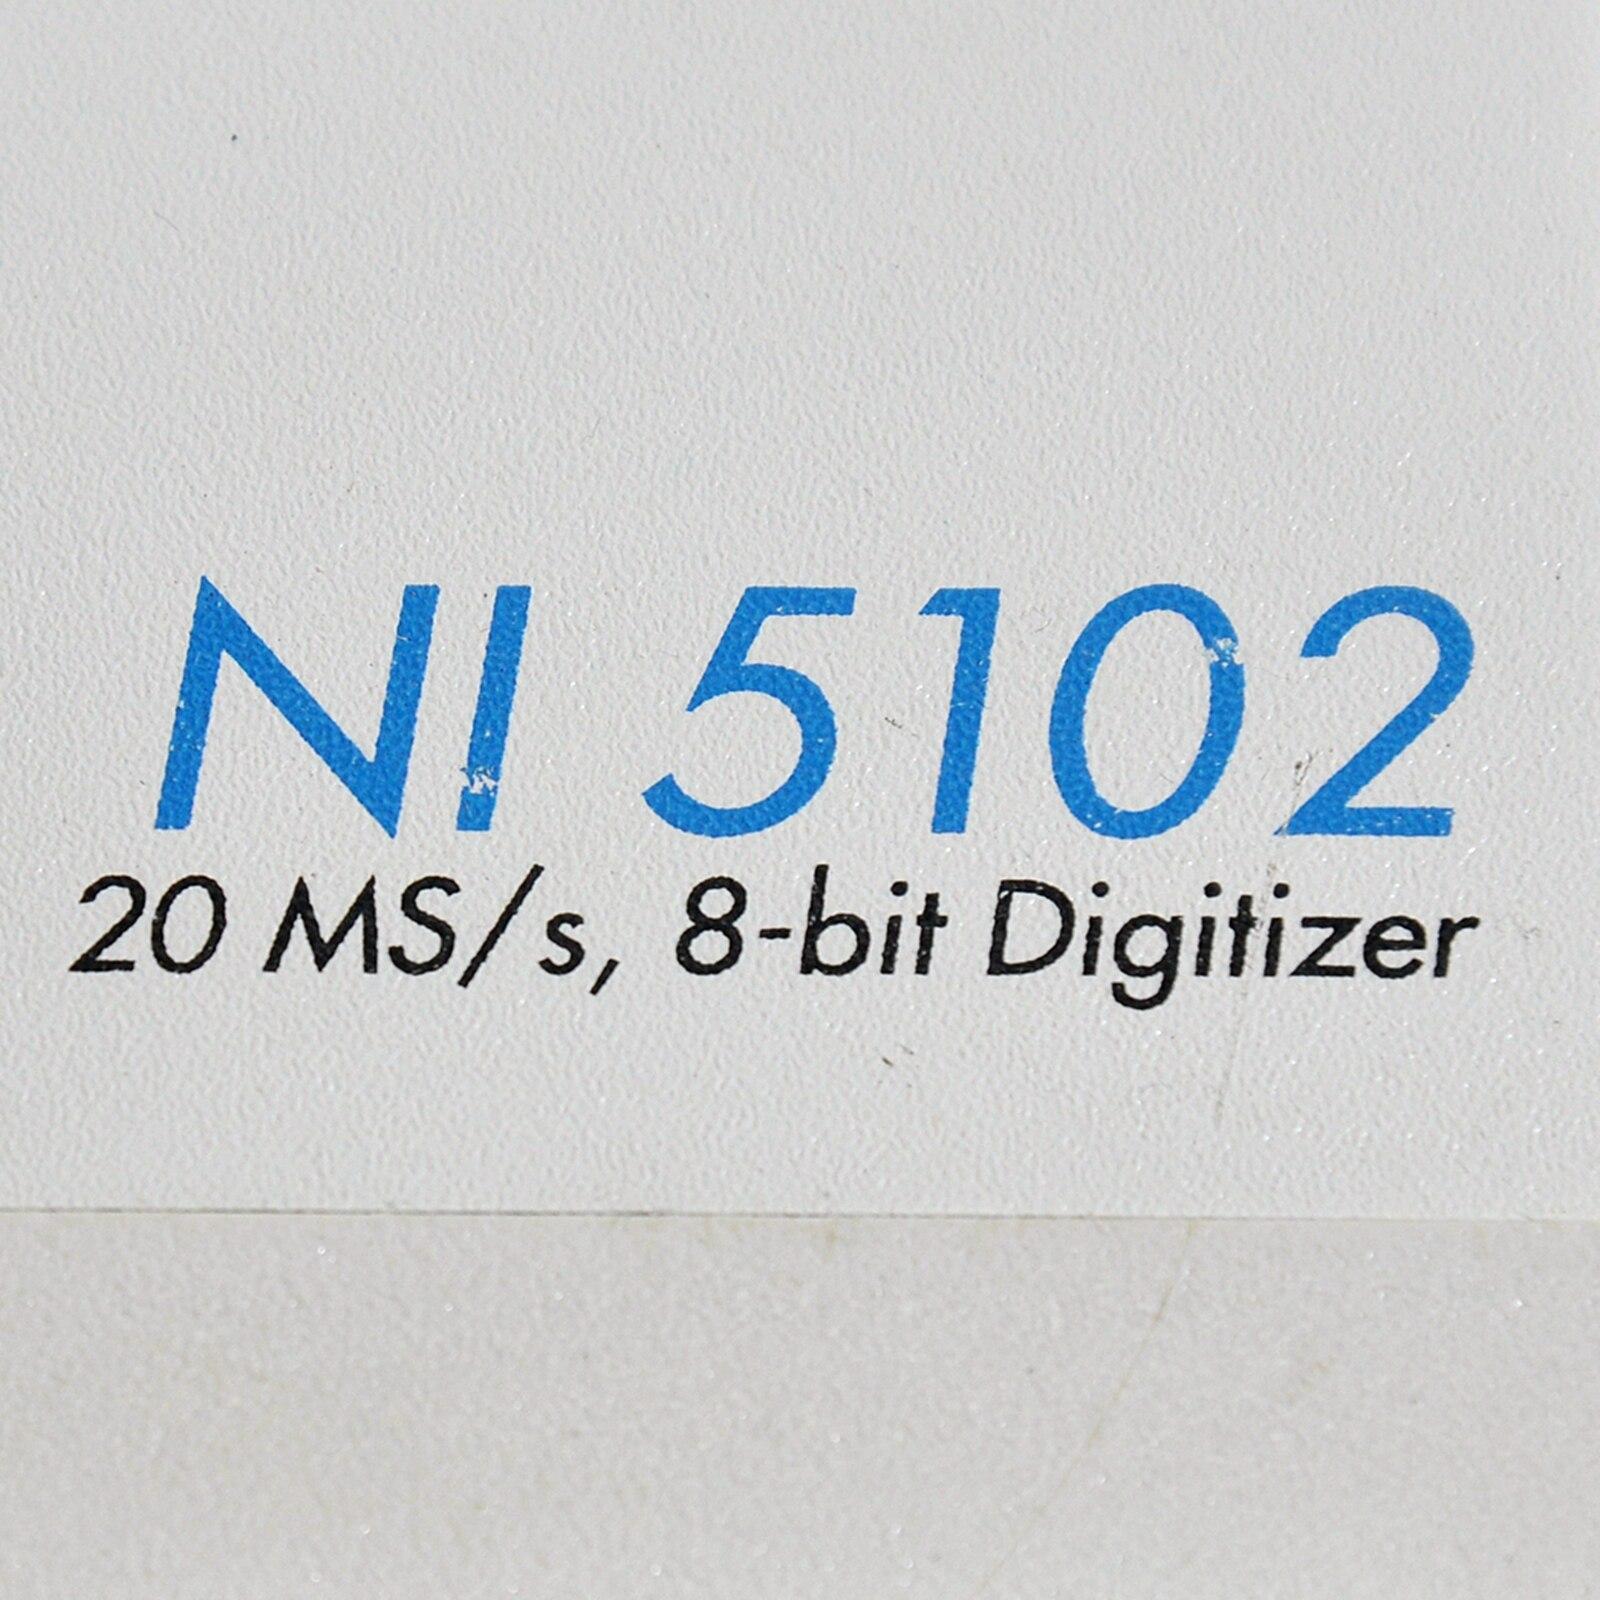 US NI 5102 digital module with manual enlarge